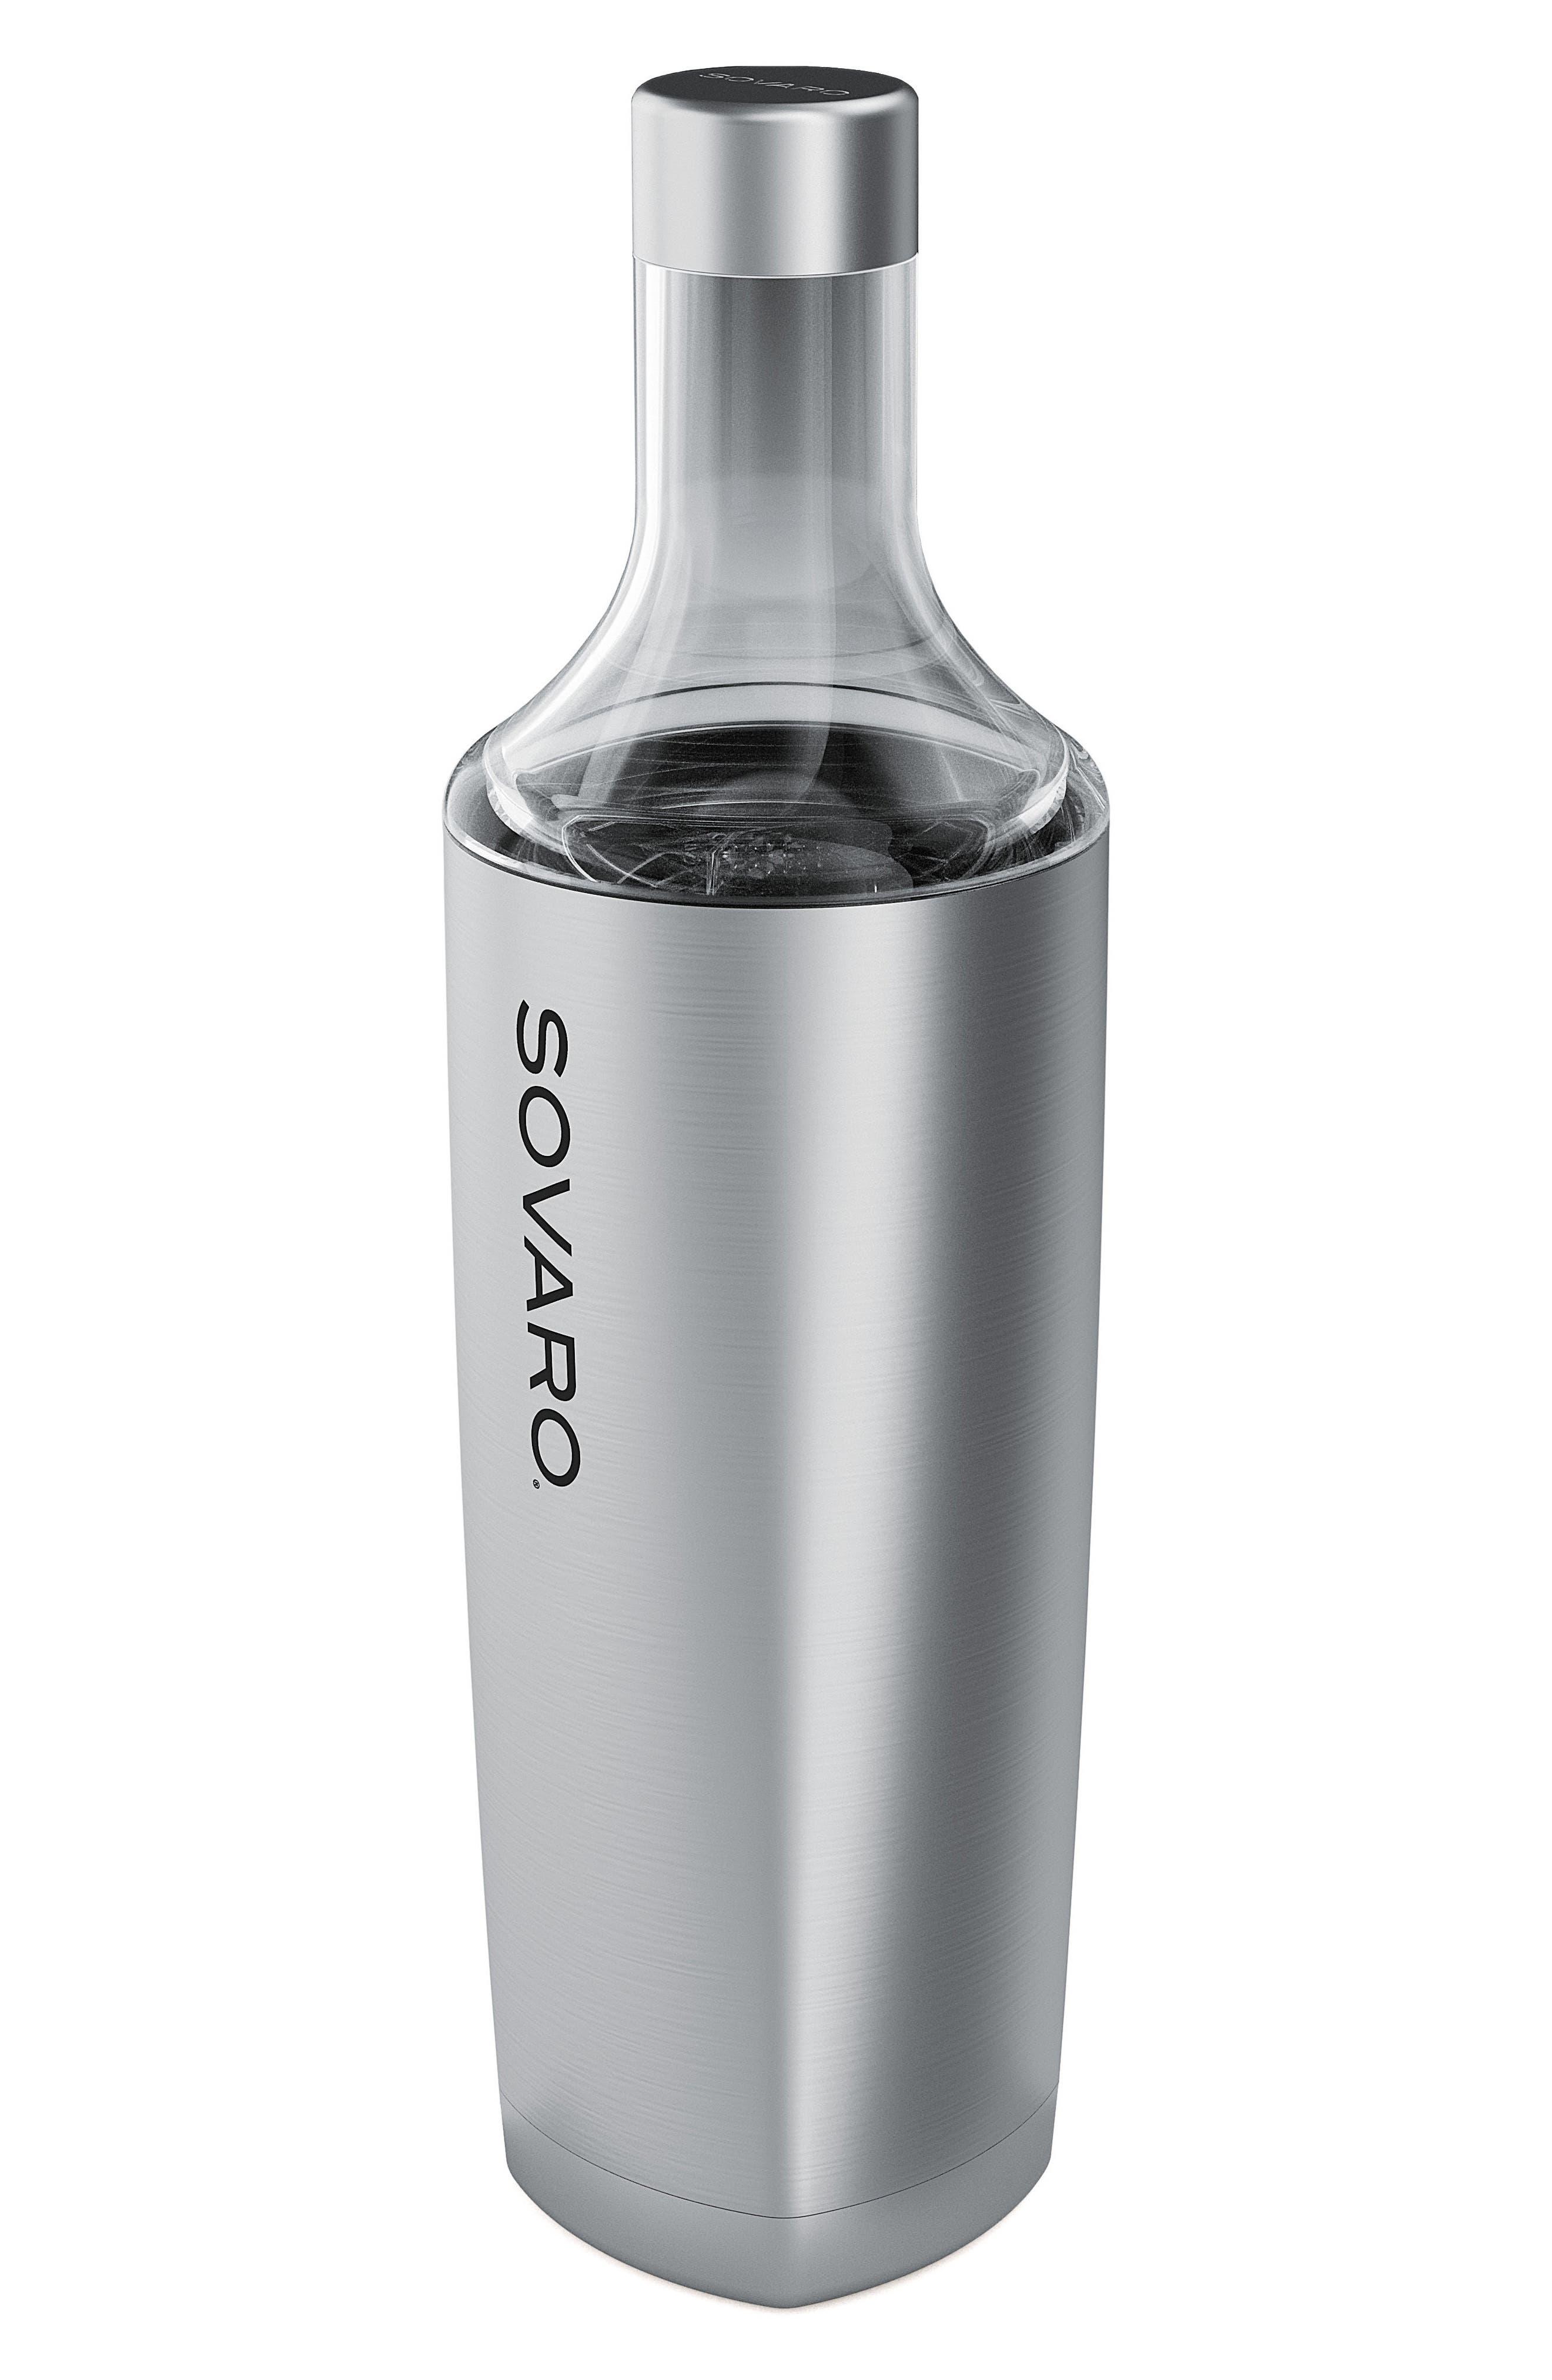 Alternate Image 1 Selected - Sovaro 25-Ounce Insulated Beverage Bottle